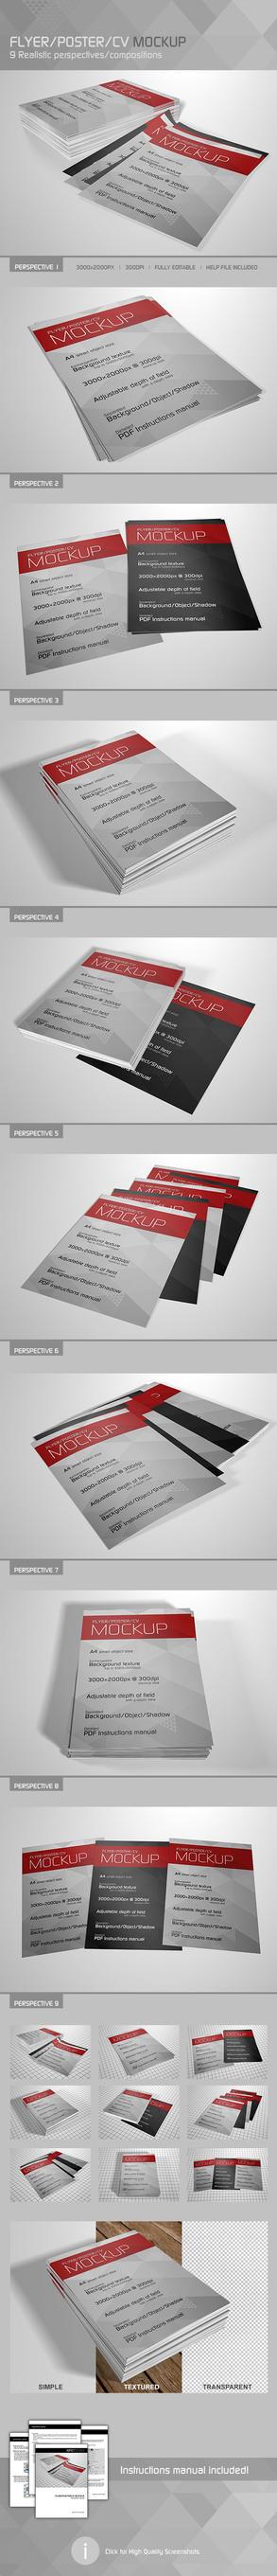 Realistic Flyer/Poster/CV Mockup 3 by Kipet